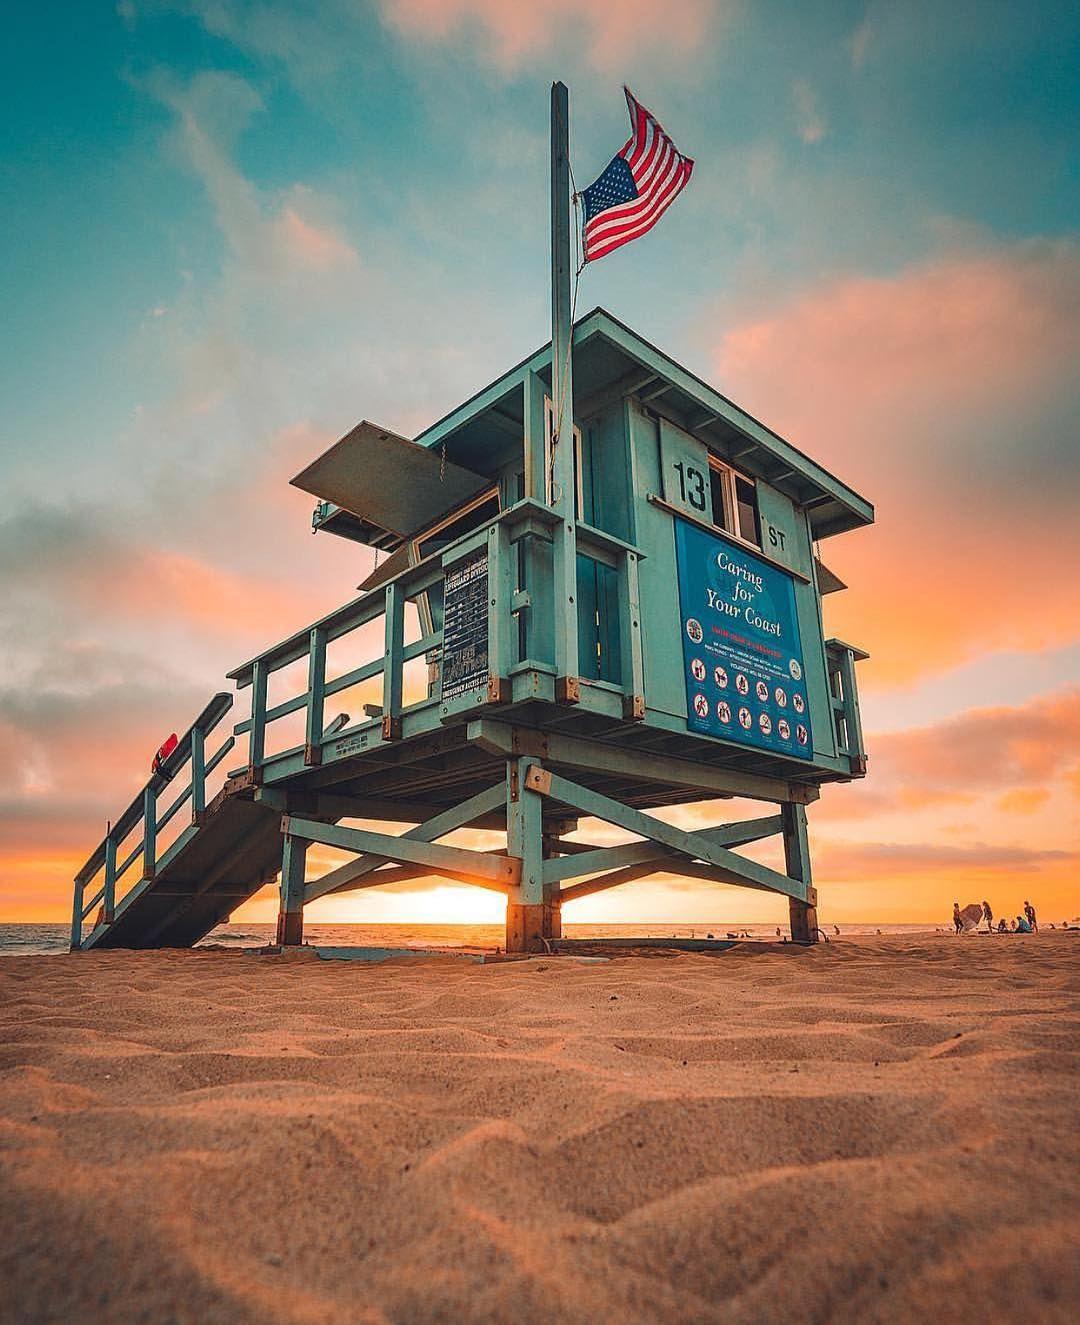 Pacific Argonaut Happy Fourth Of July Los Angeles Discoverla California Dreaming California Los Angeles